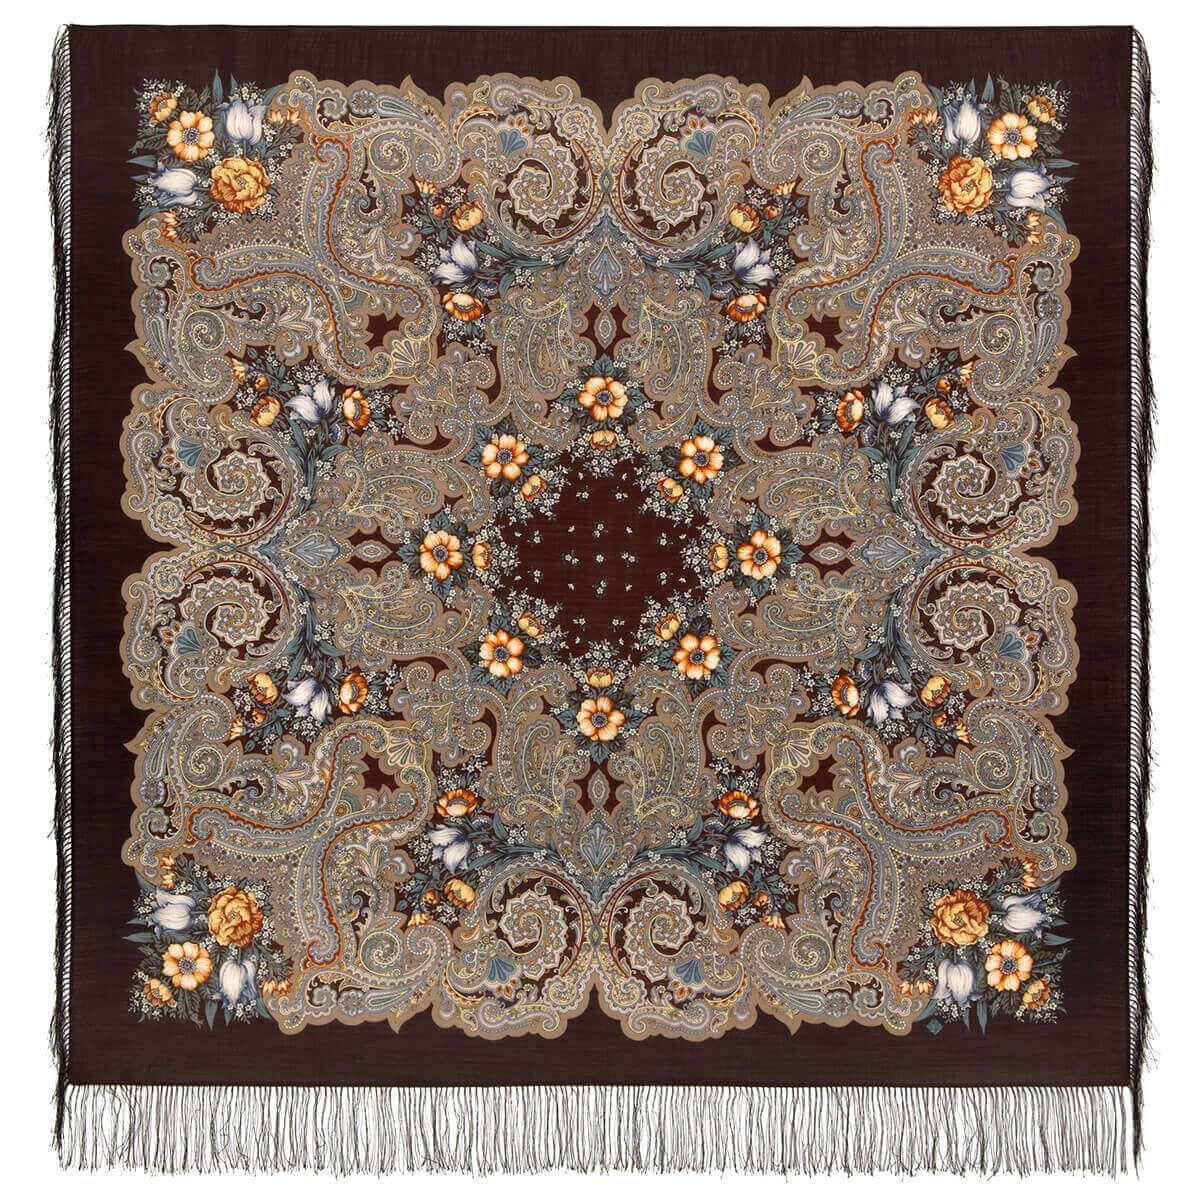 Павлопосадский платок Летнее чудо 1885-5 (146х146 см)